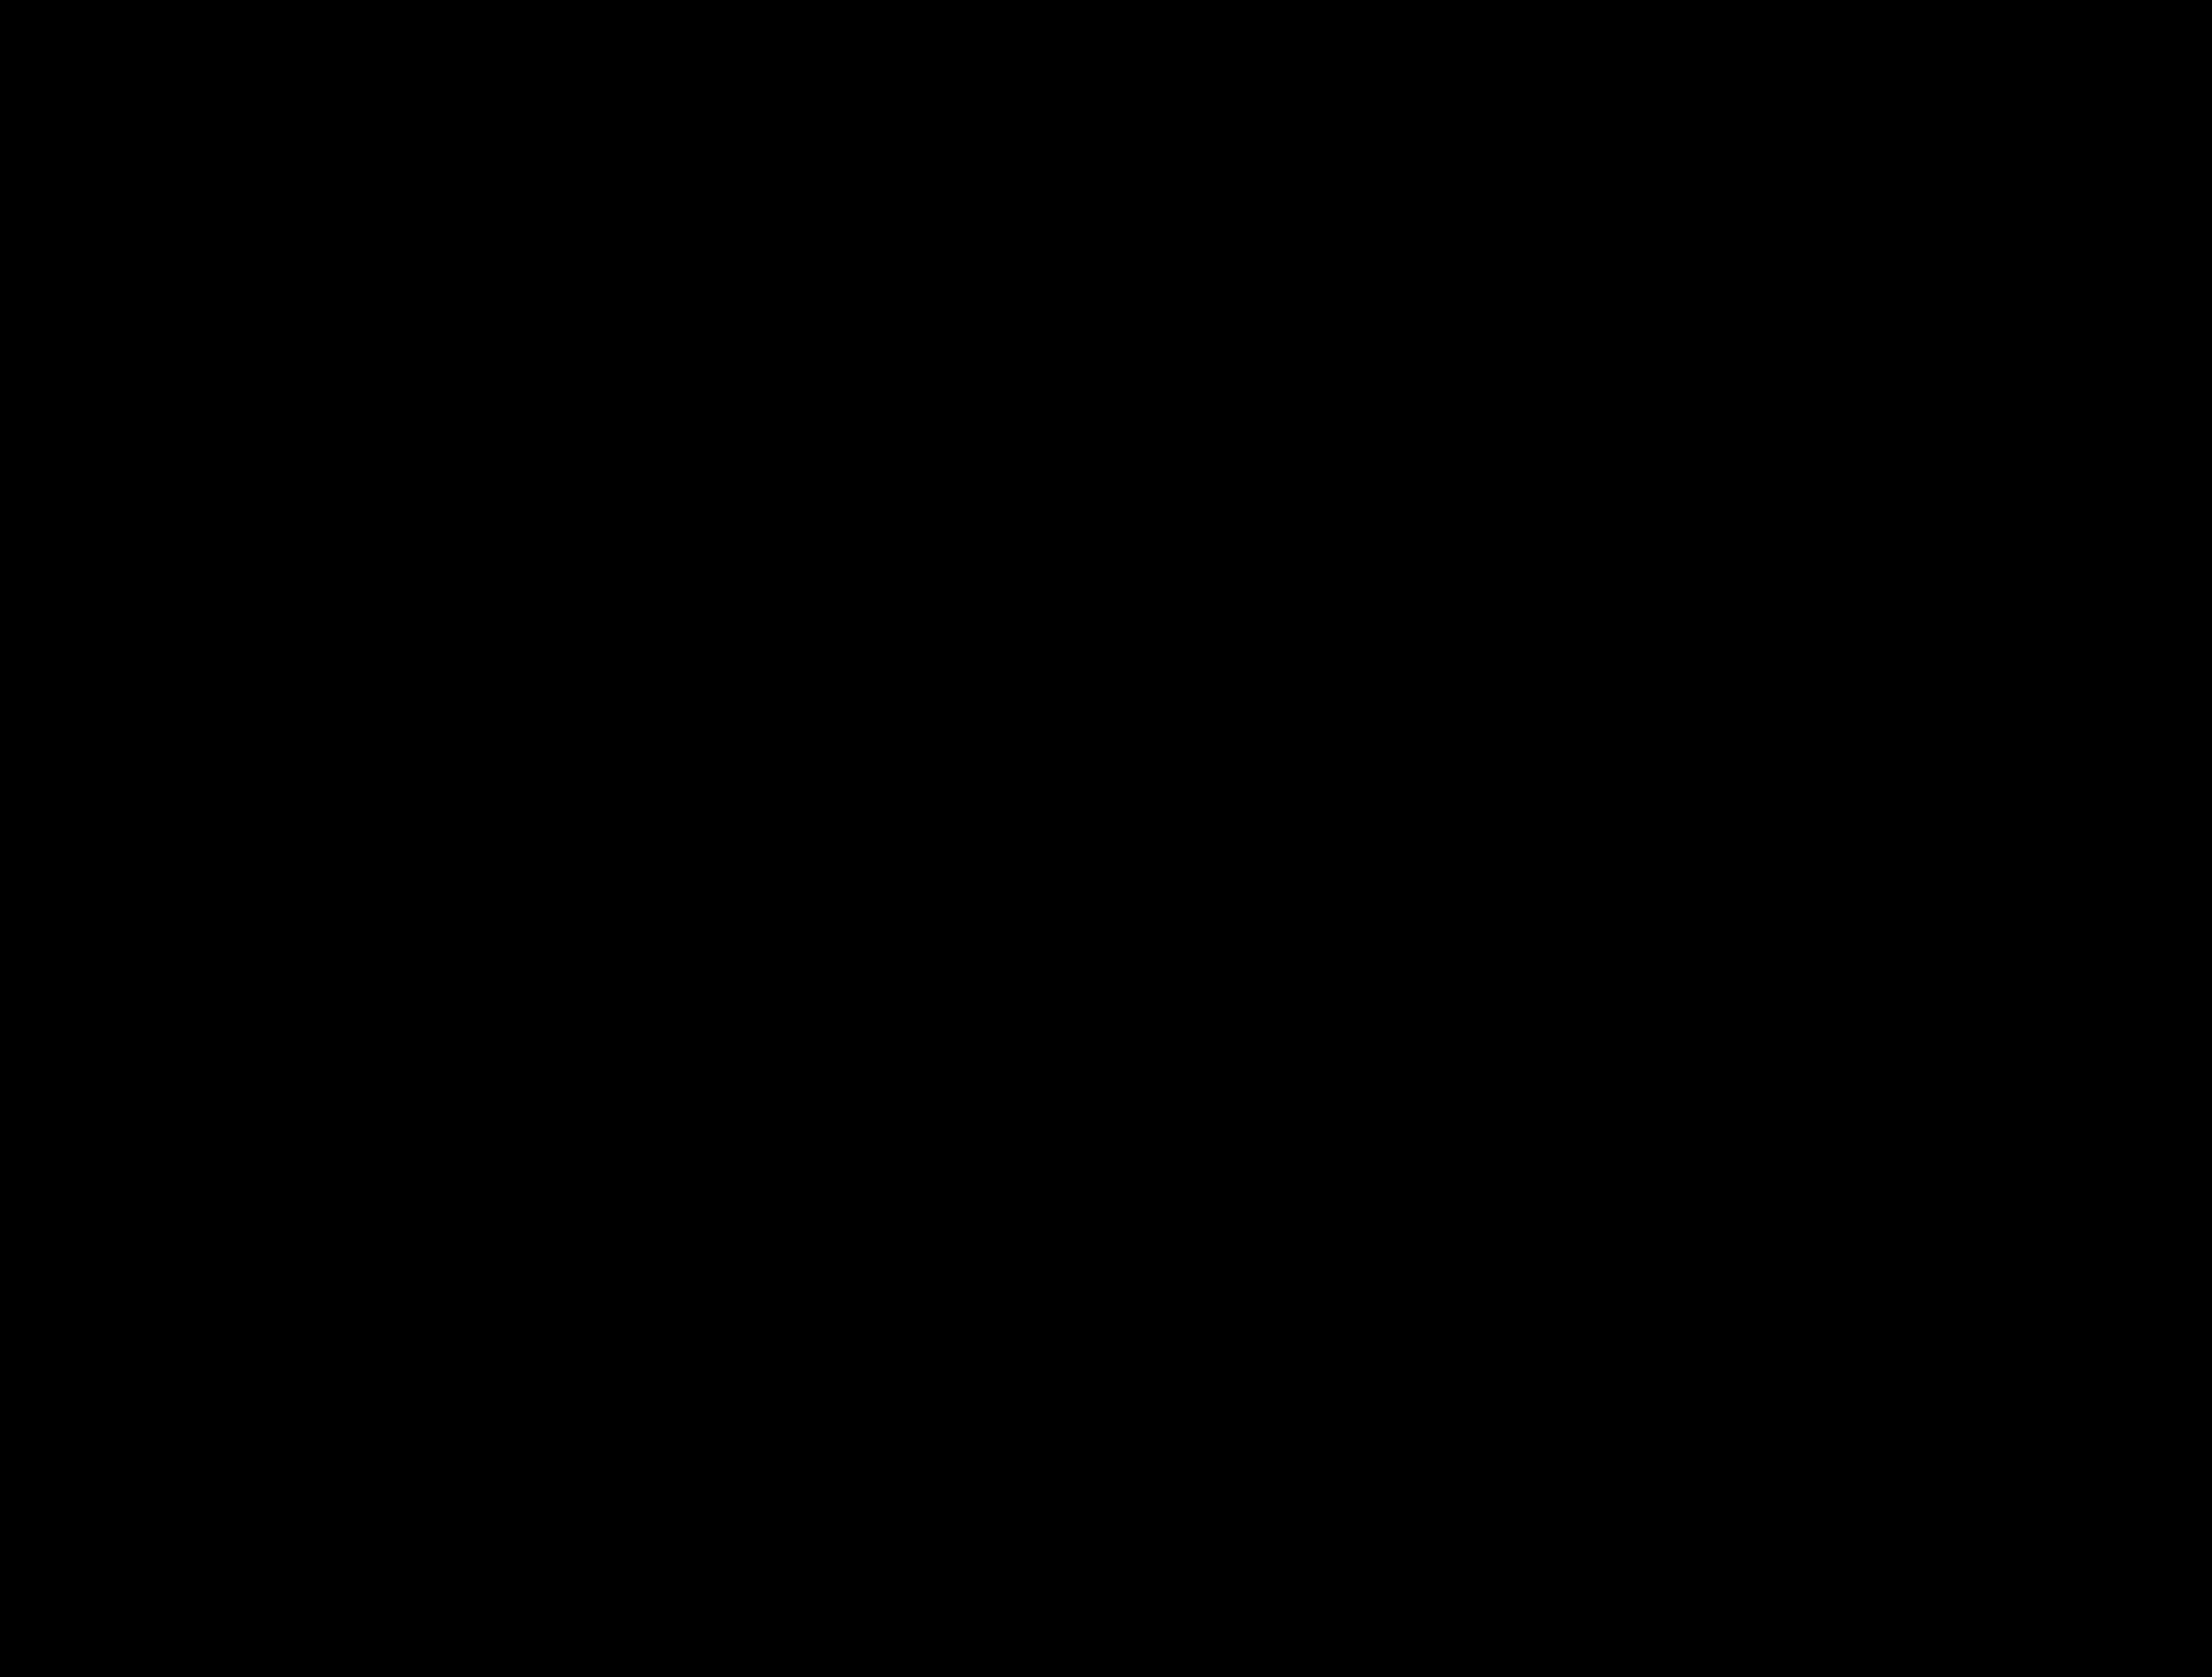 TENSTICKERS. 小さなシンボルハロウィン壁デカール. バット、カボチャ、手、墓を含む小さなシンボルハロウィンデカールデザイン。さまざまな色とサイズのオプションが用意されています。